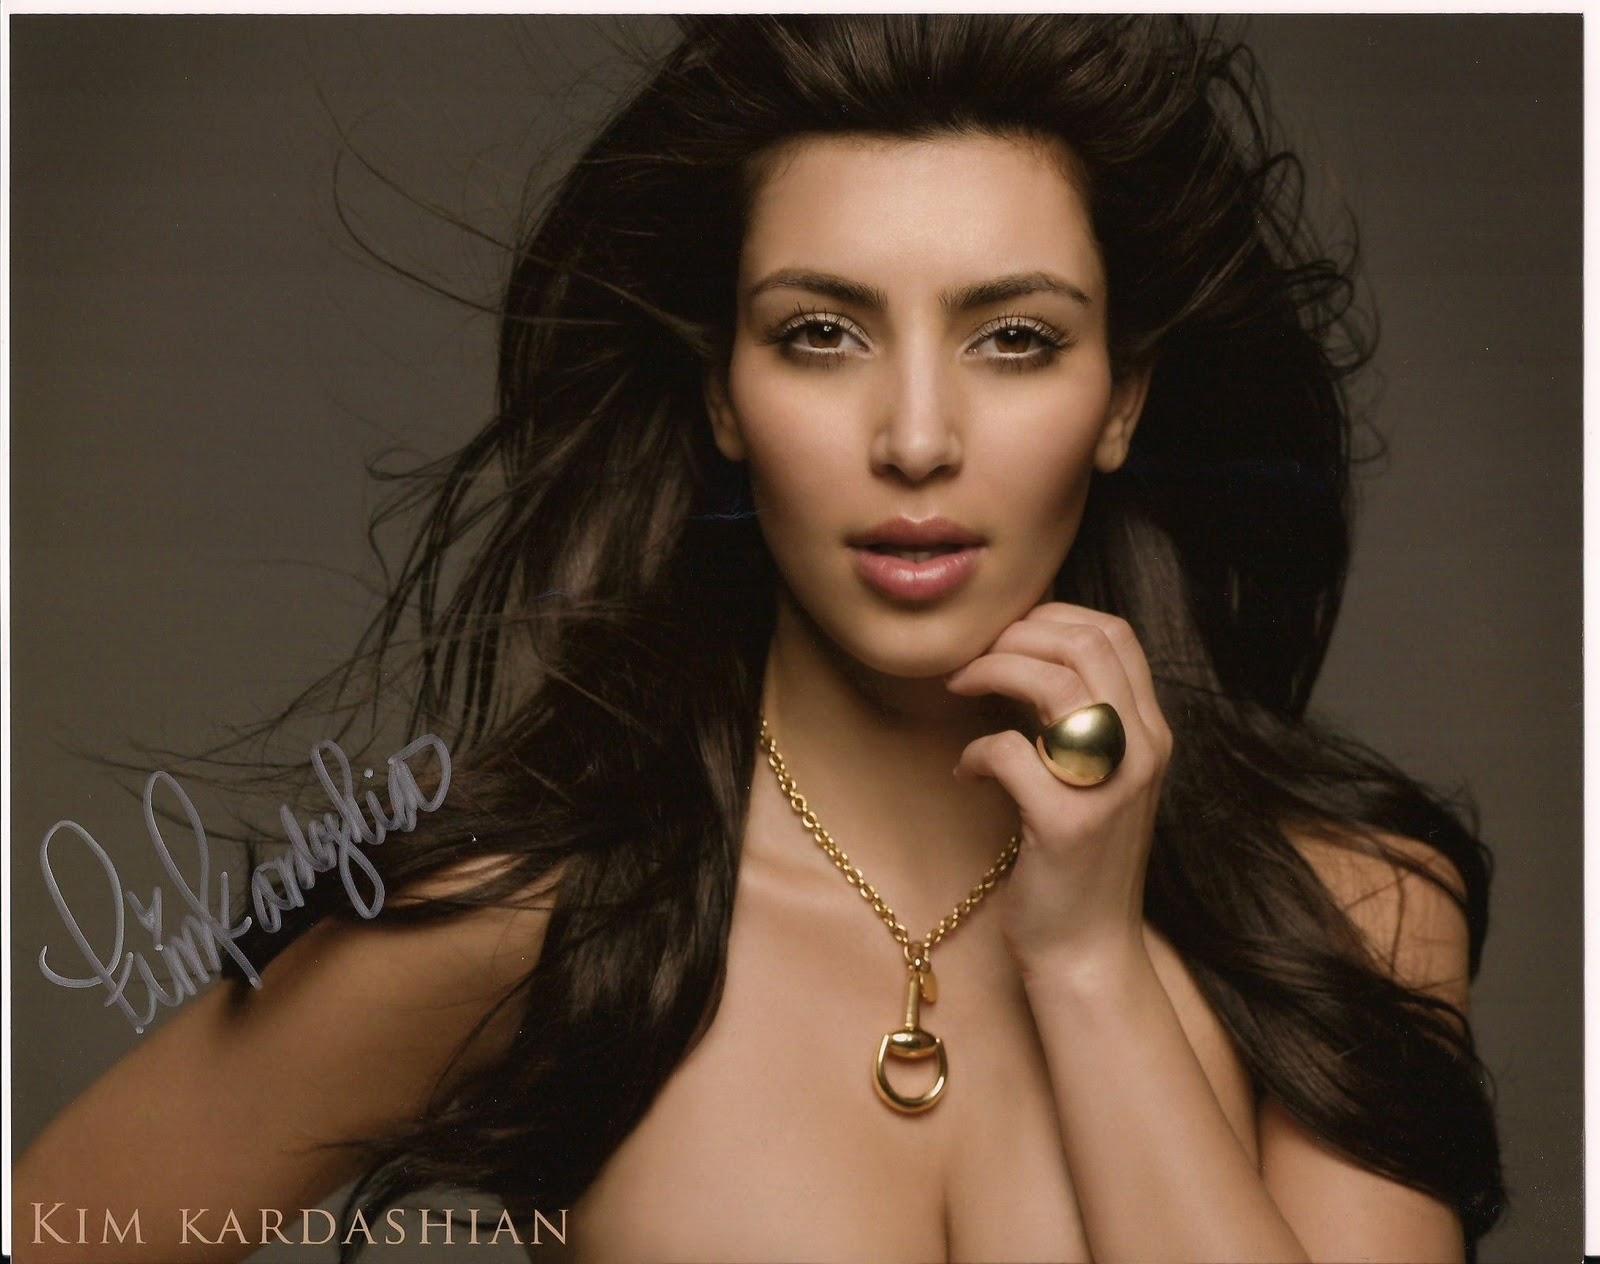 http://2.bp.blogspot.com/-9kE31zplDLk/ToD2Ul2YdXI/AAAAAAAAAmk/GvwC90fLu6I/s1600/kim-kardashian-makeup-pics.jpg